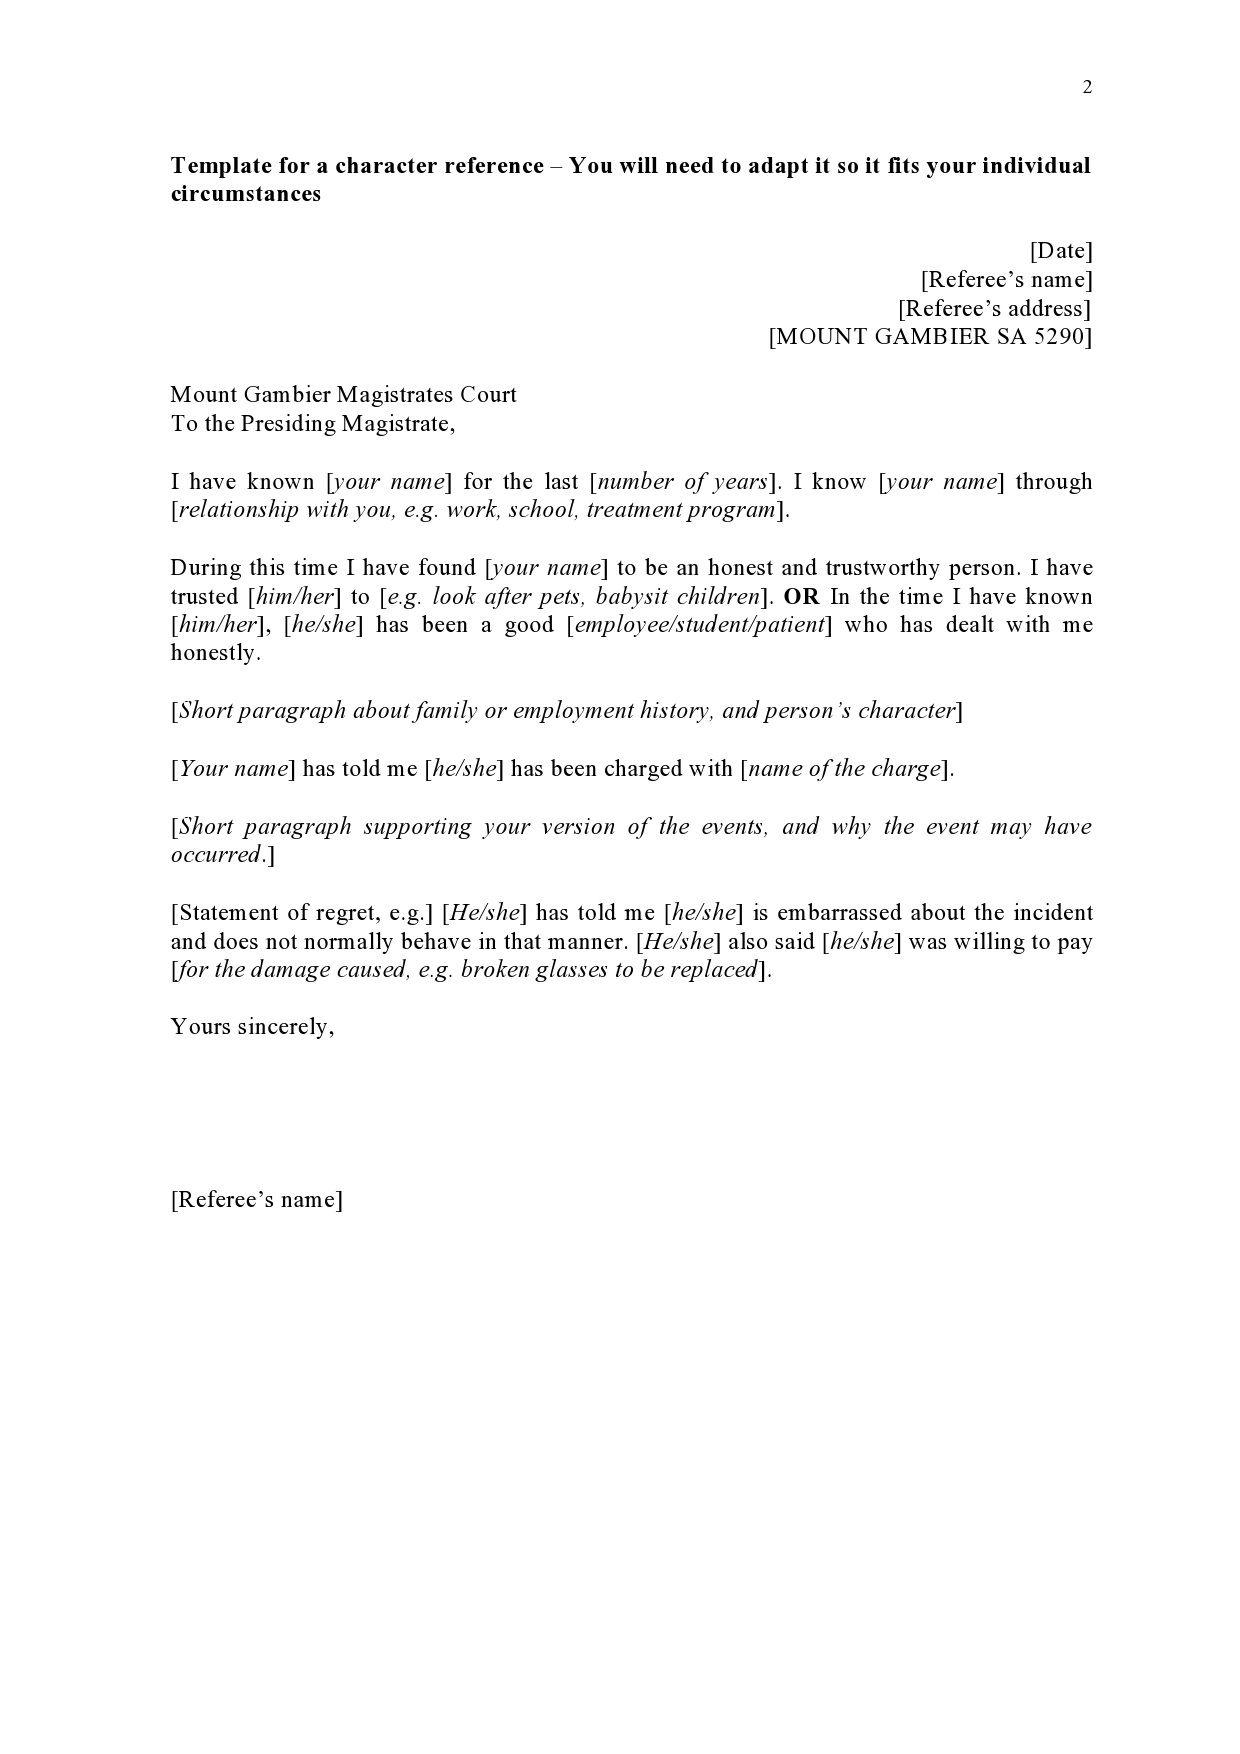 002 Fantastic Letter Of Reference Template Sample  For Employee Word Coworker TeacherFull